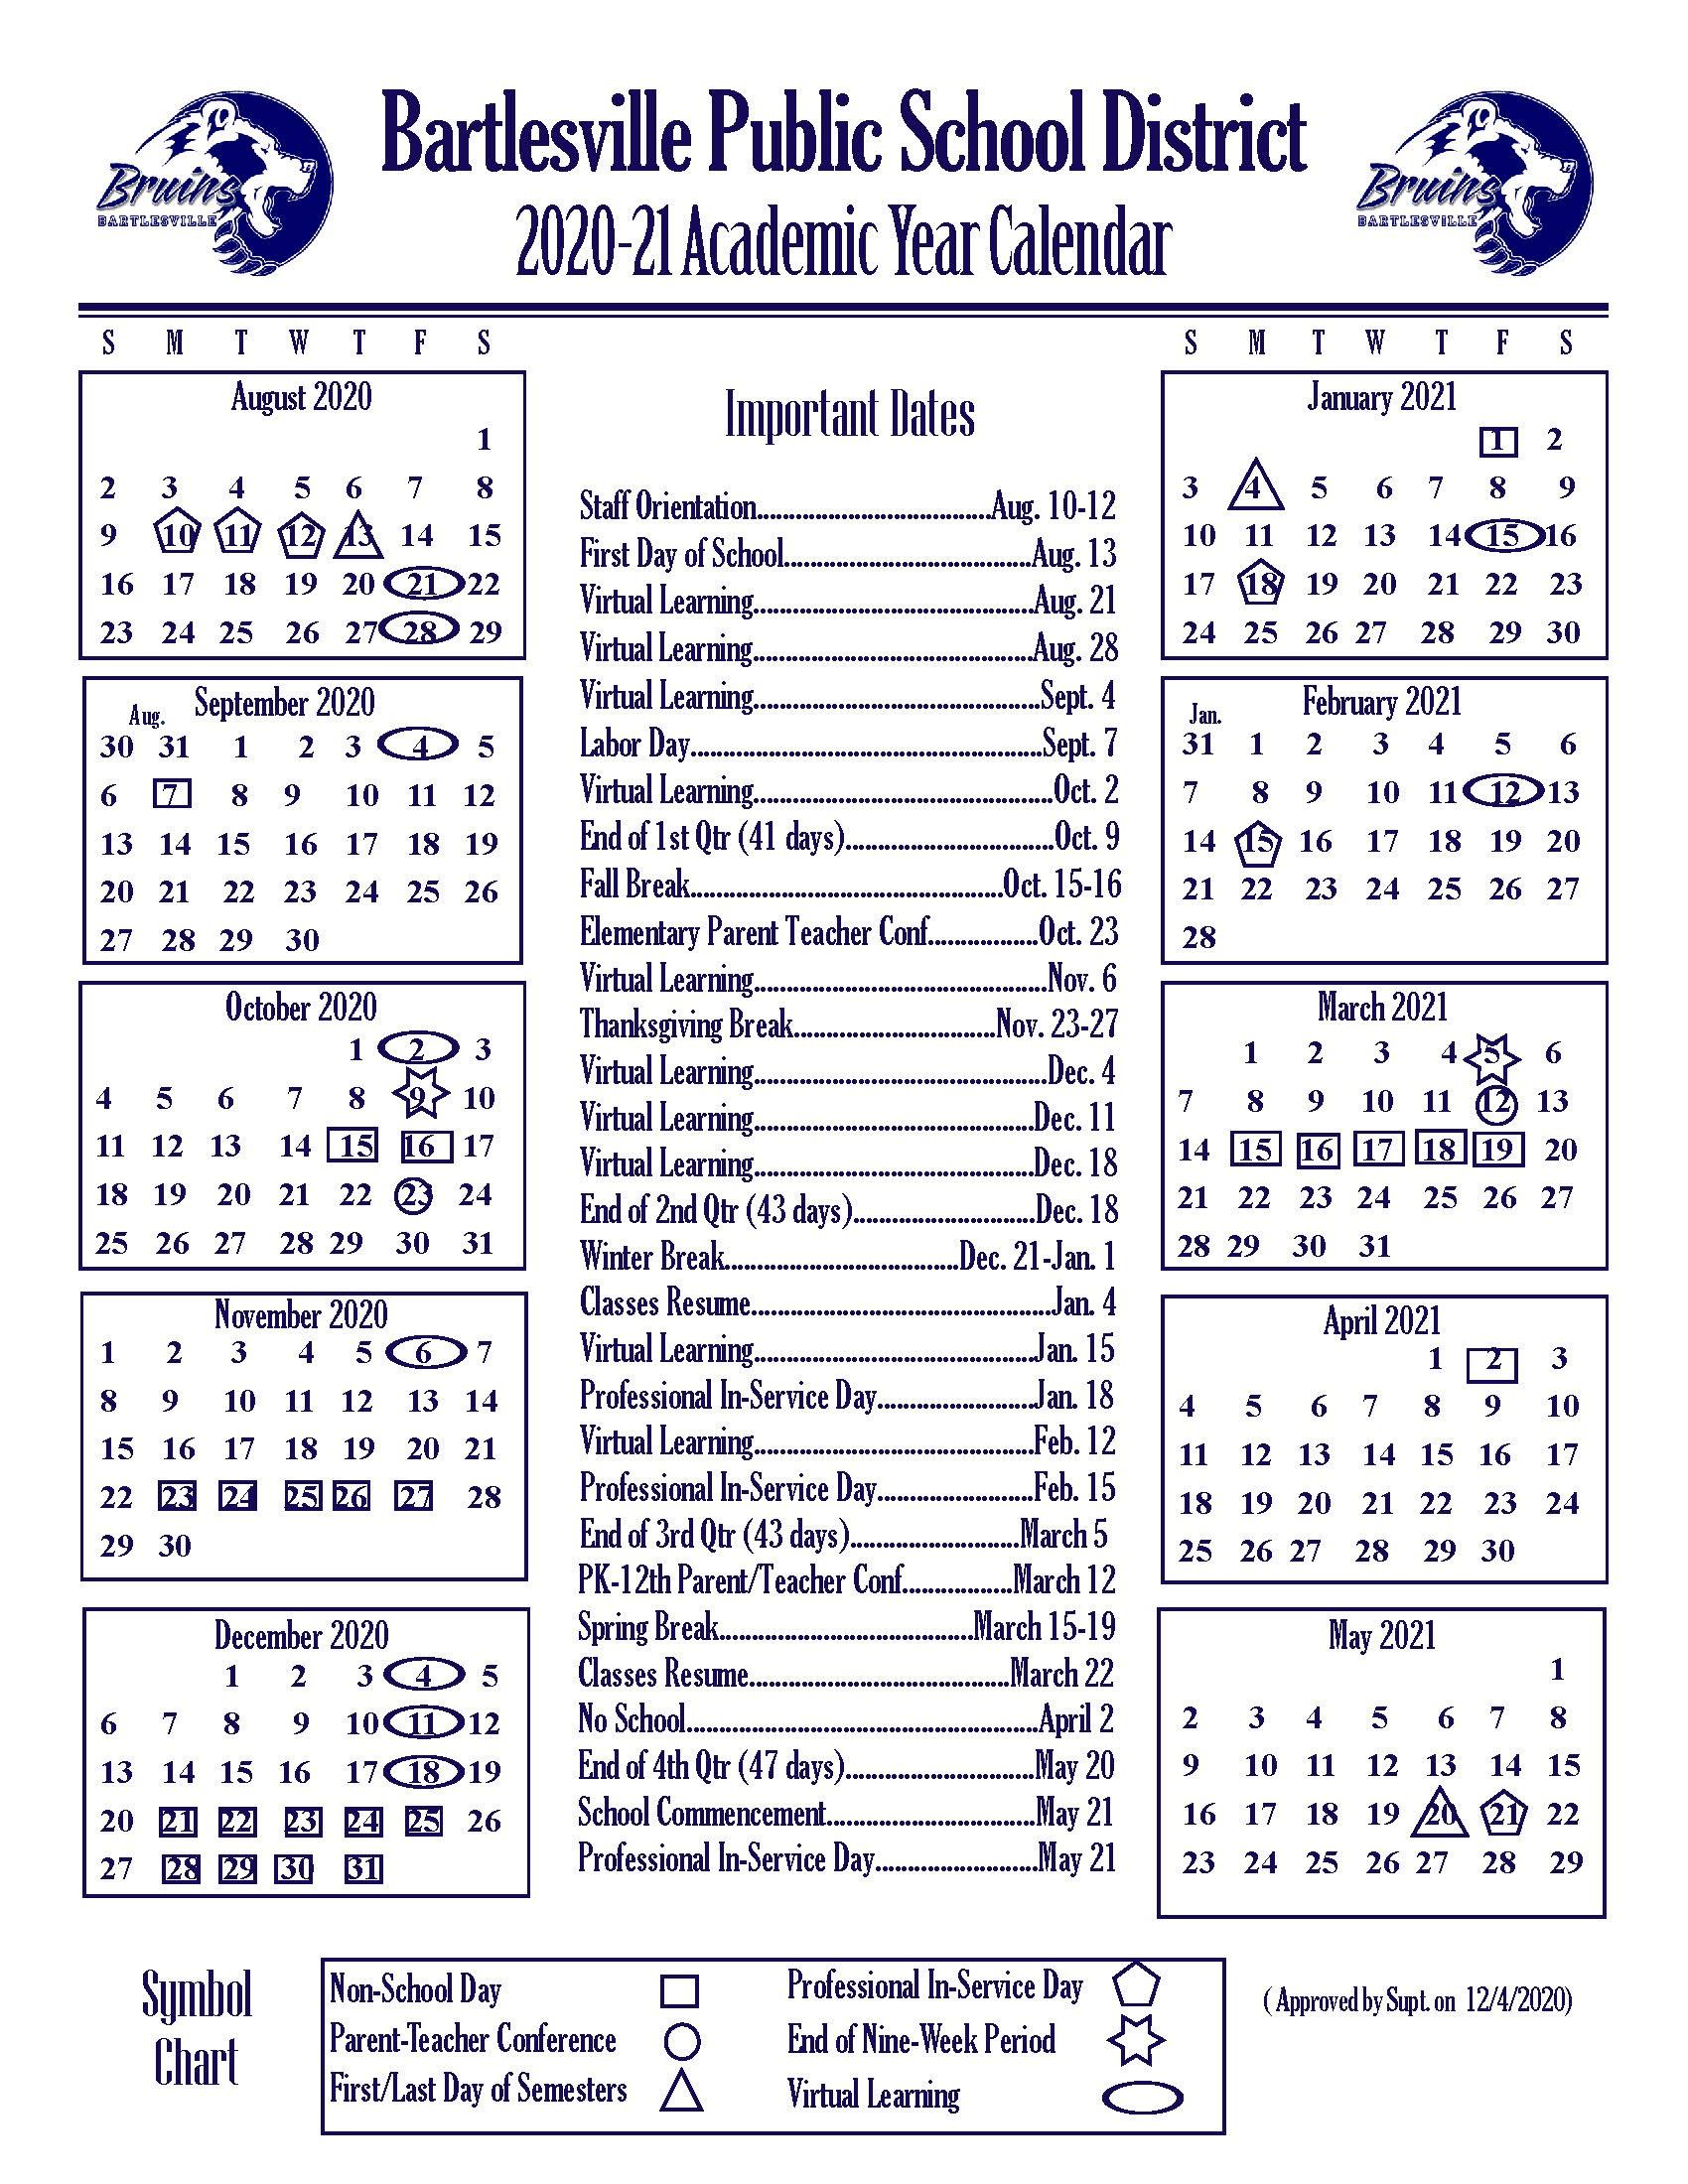 Bps Calendar 2022.Academic Year Calendars Former Bps Website